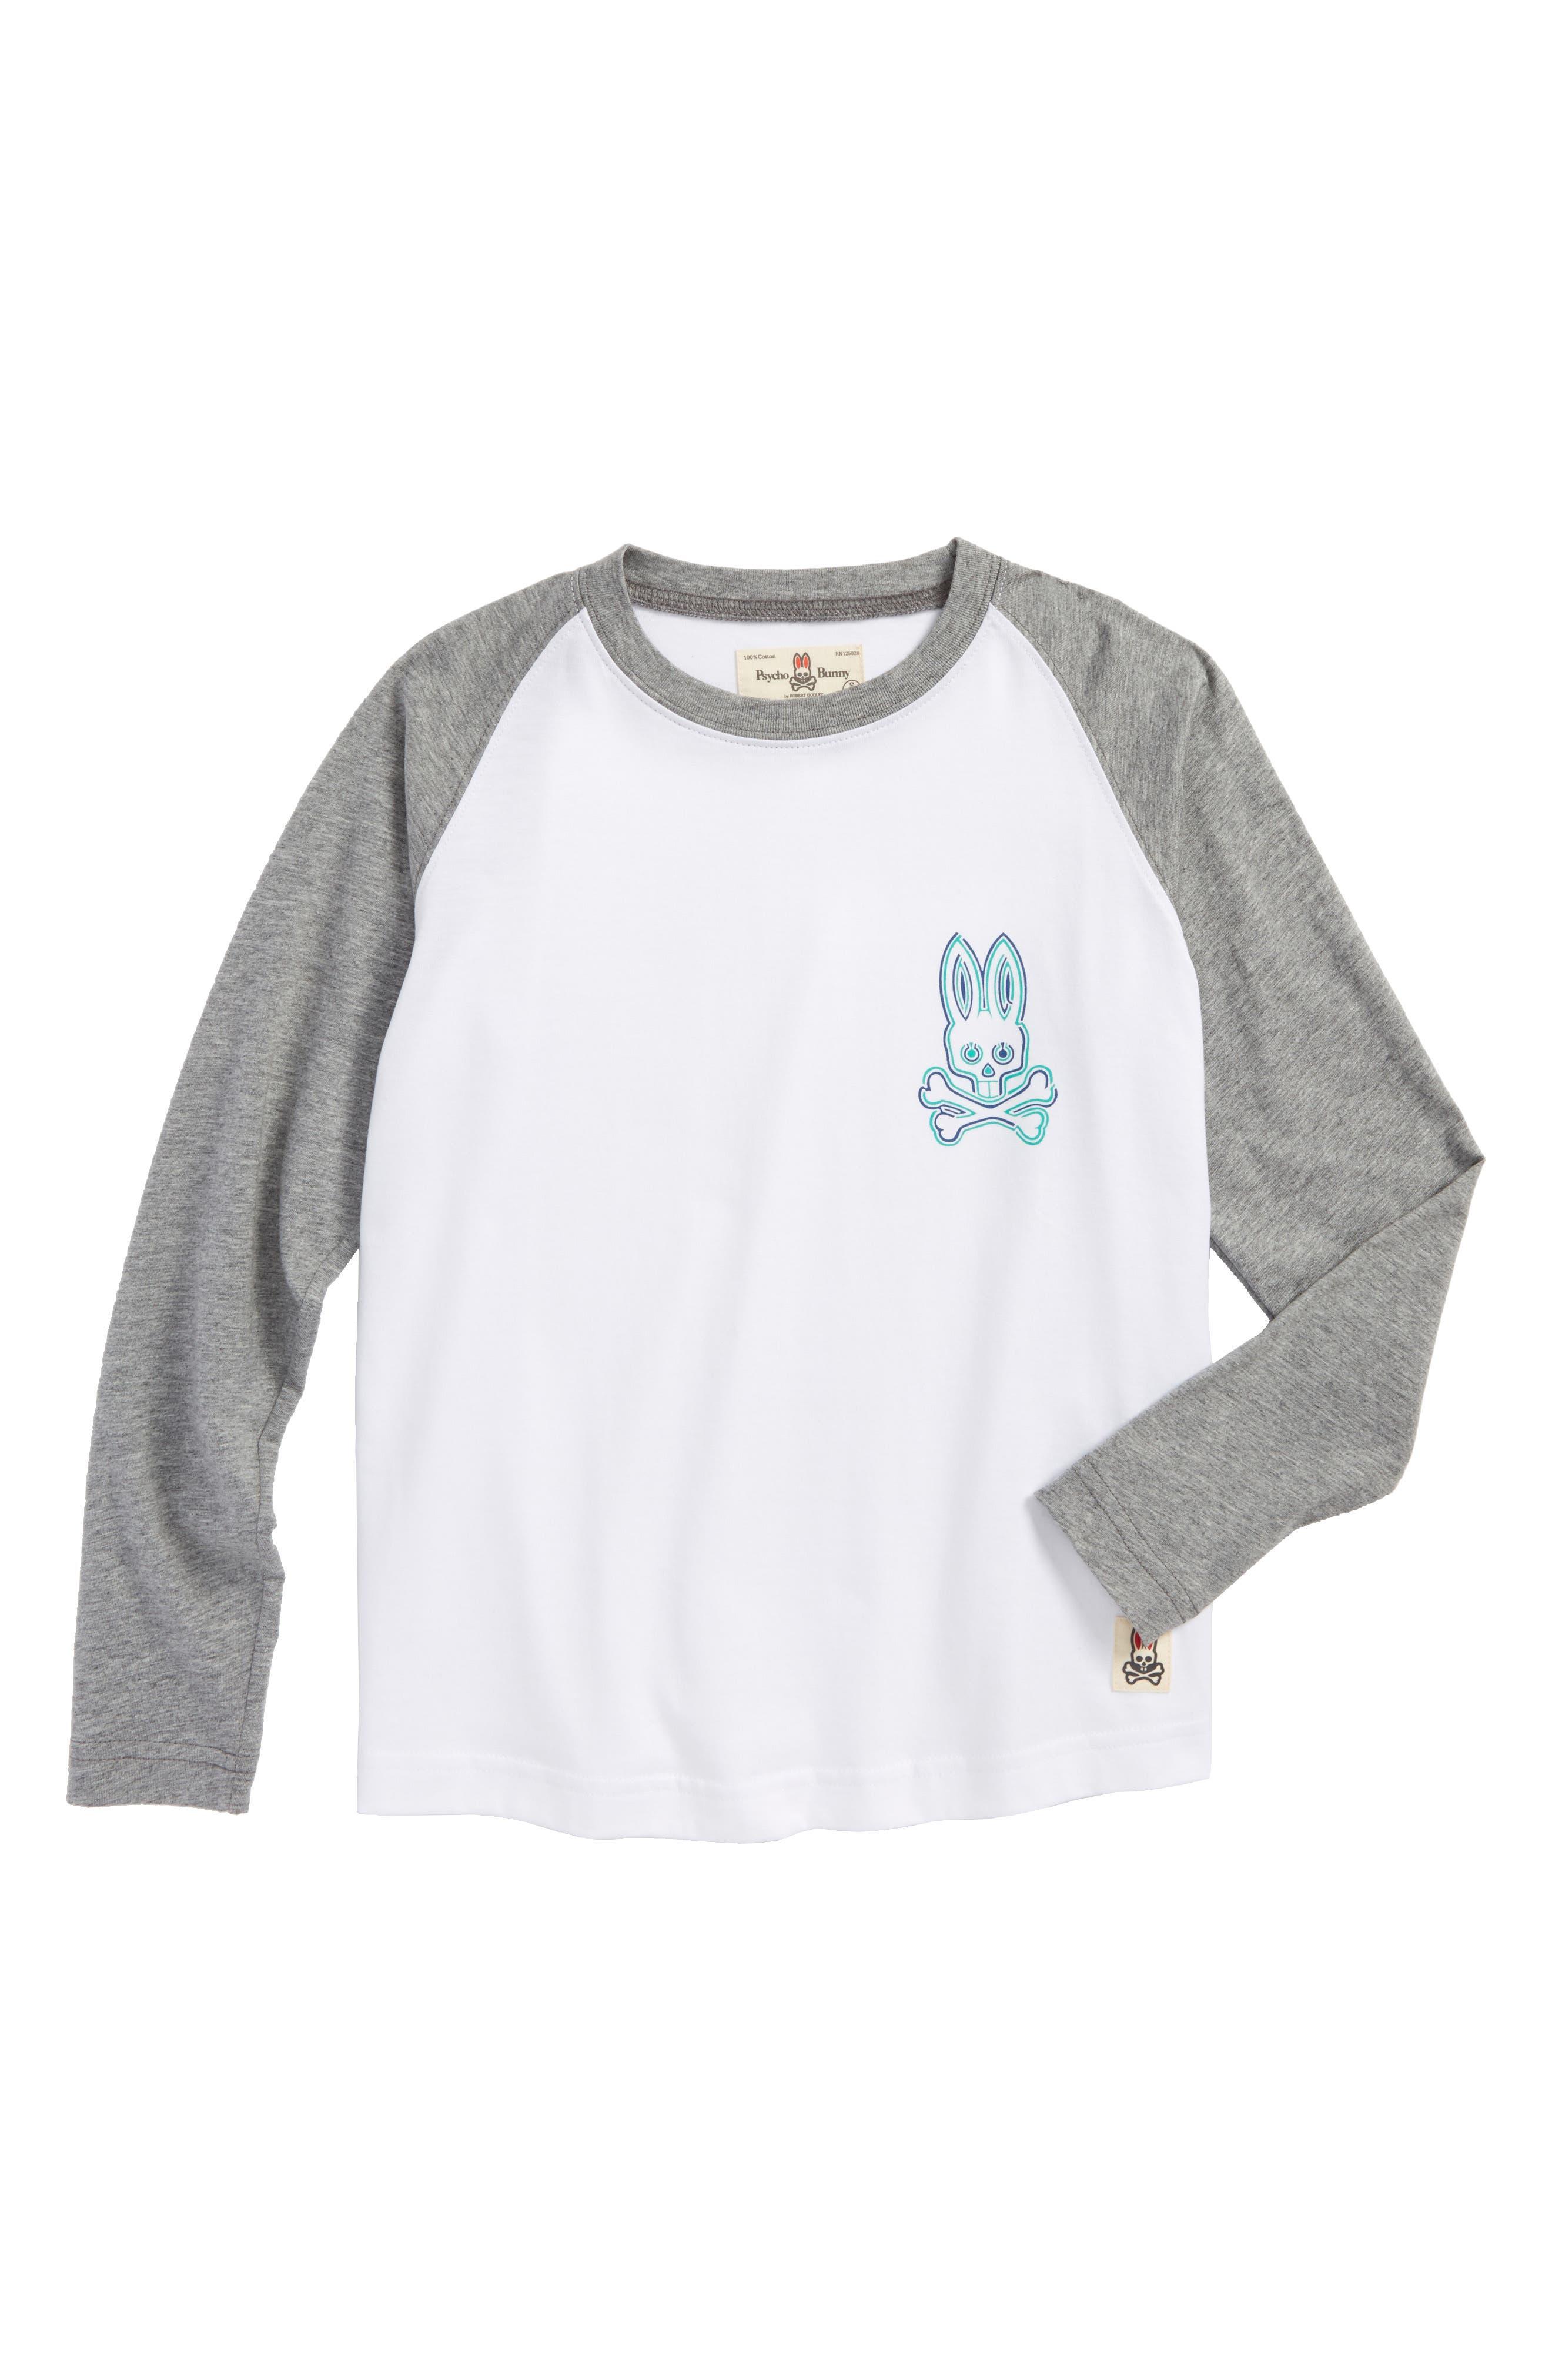 Alternate Image 1 Selected - Psycho Bunny Mantle Pima Cotton T-Shirt (Little Boys & Big Boys)